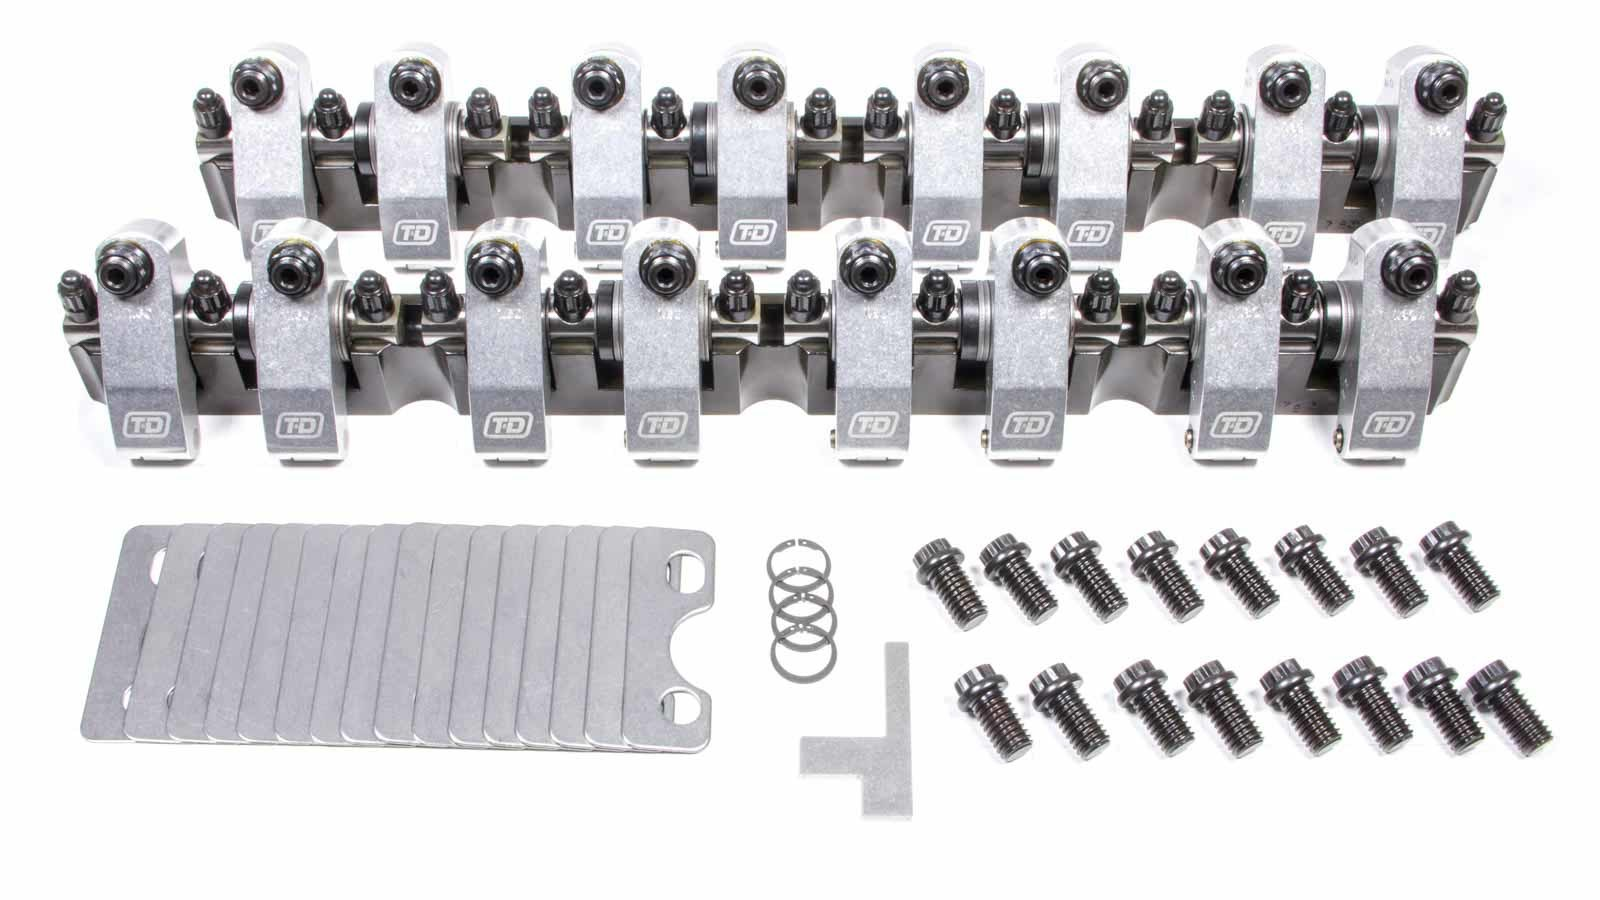 T&D Machine 7341-165/165 Rocker Arm, Shaft Mount, 1.65 Ratio, Full Roller, Aluminum, Natural, AFR 205 / 220 Big Valve, Small Block Ford, Kit